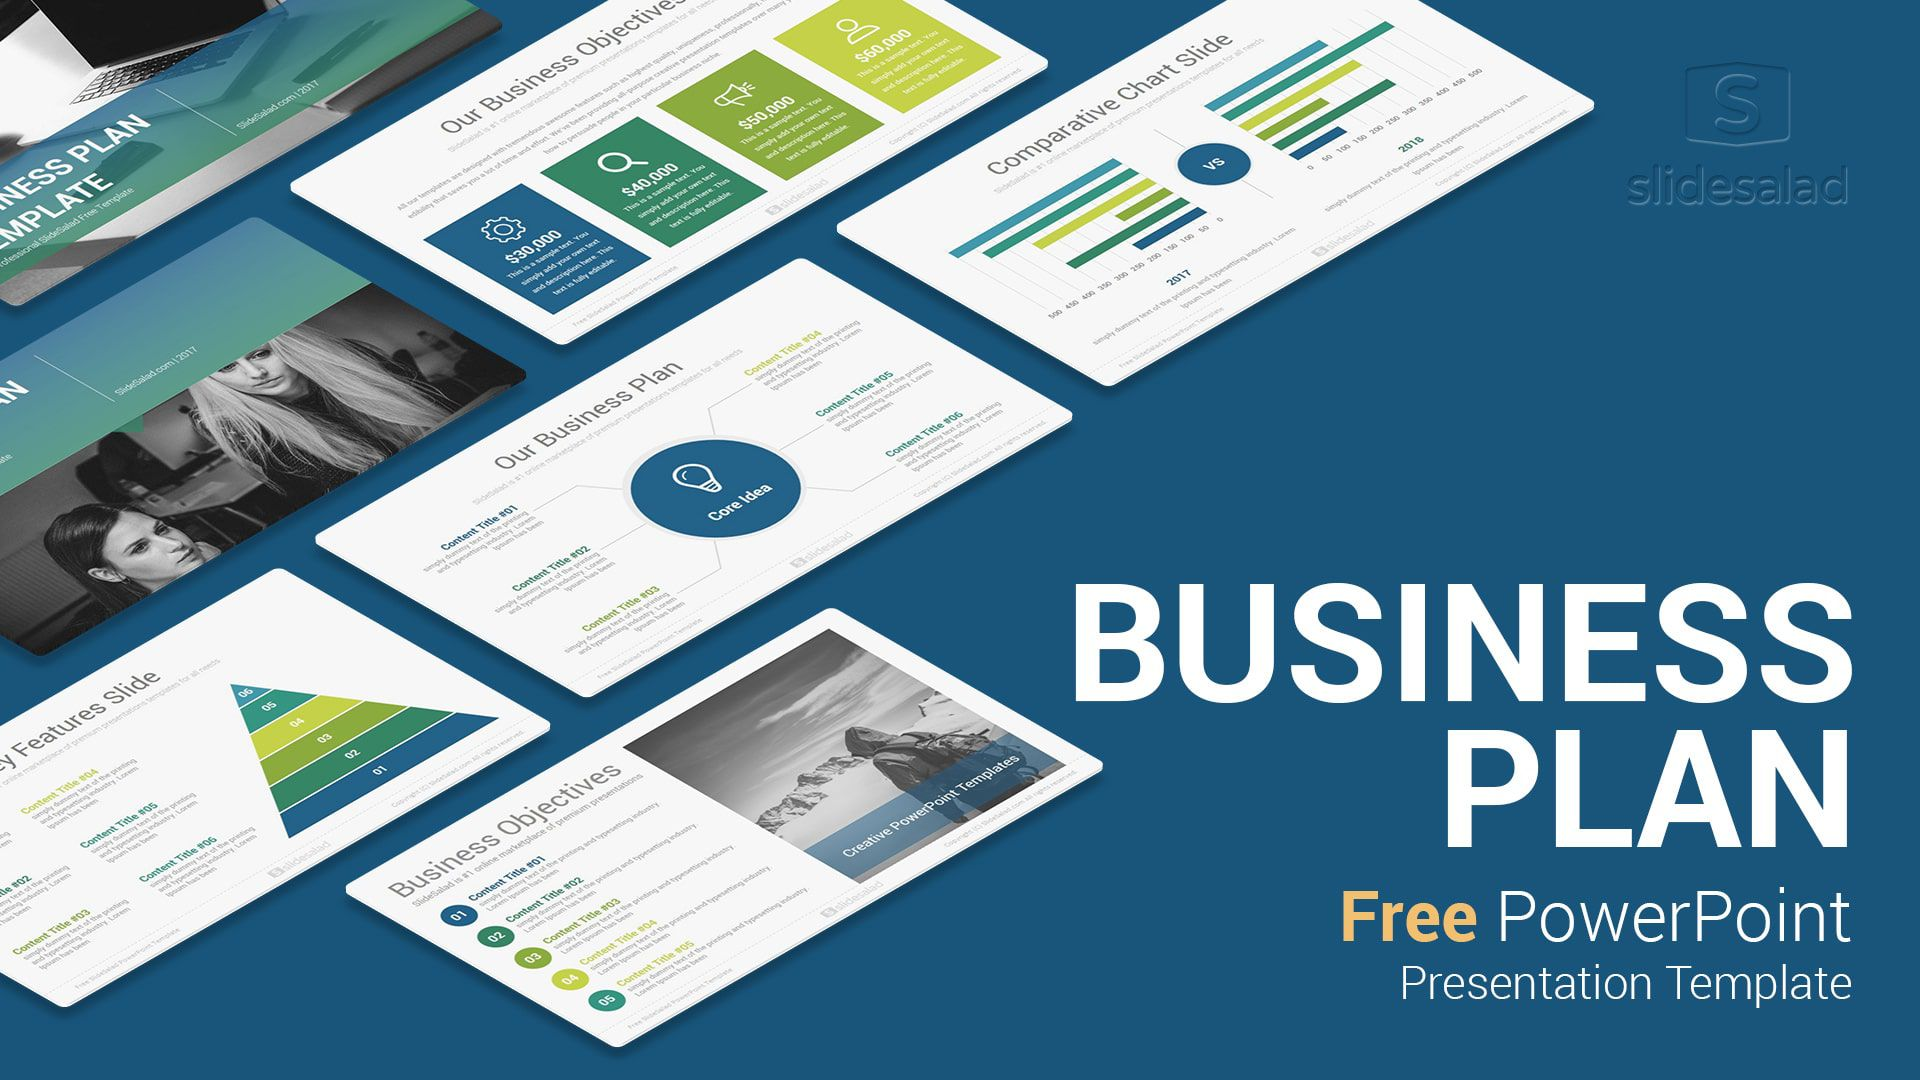 006 Marvelou Free Download Busines Proposal Template Ppt Highest Clarity  Best Plan Sample Plan.ppt 2020Full